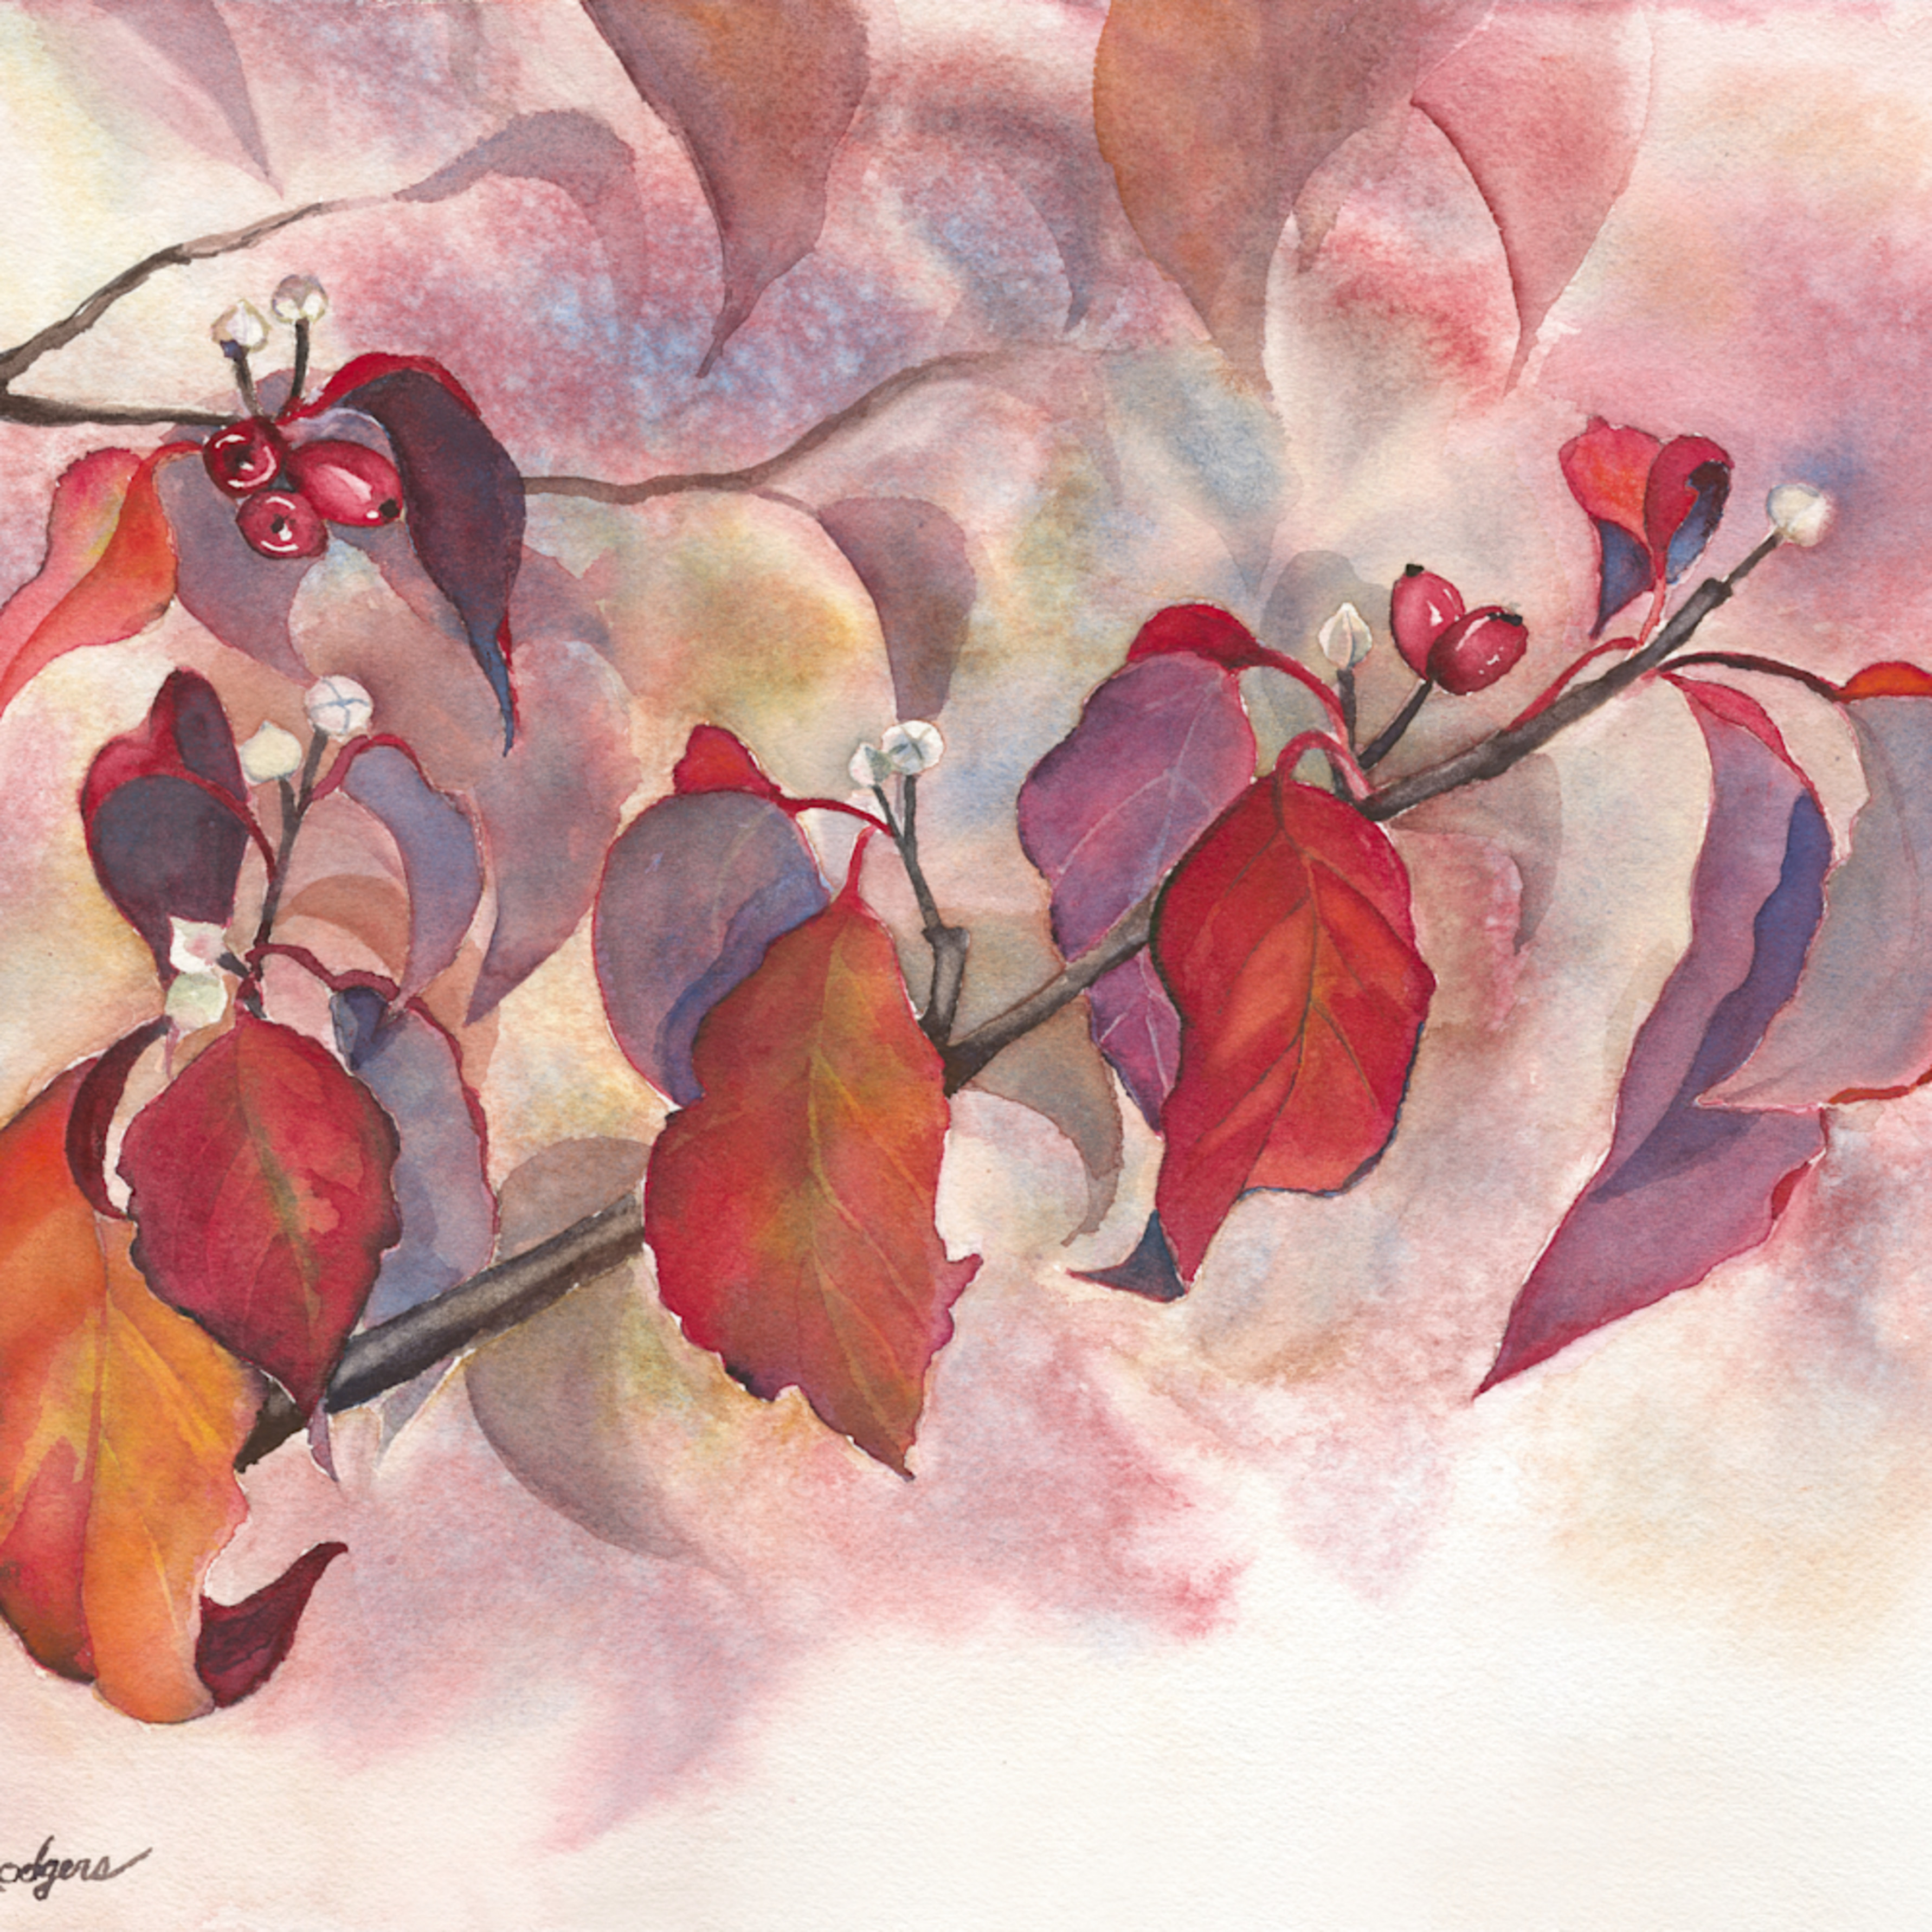 Dogwood fall highres xezeik